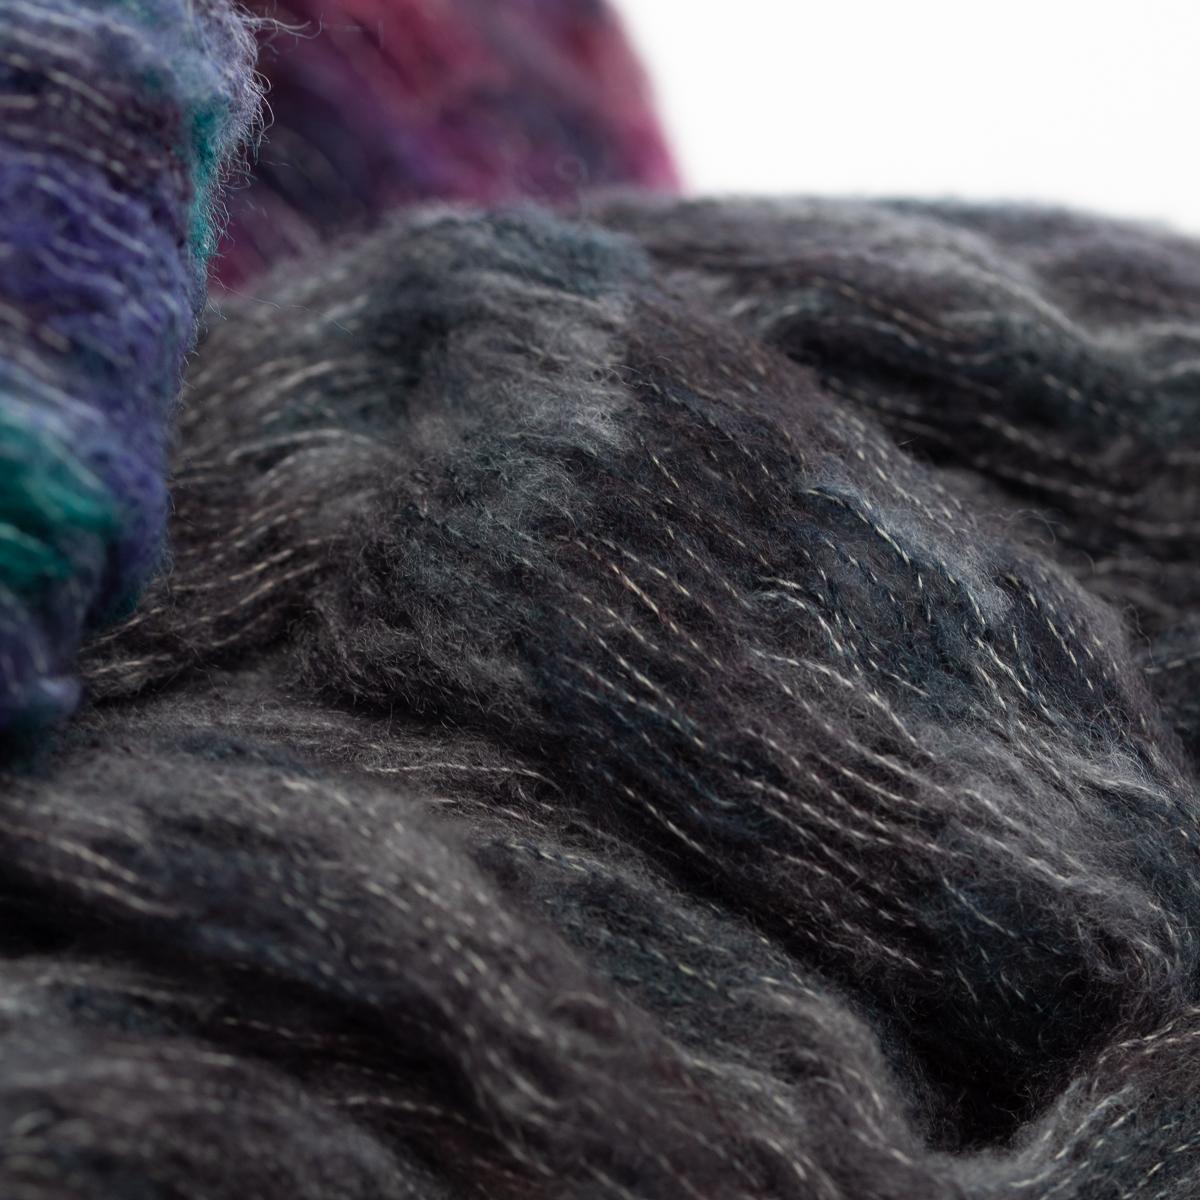 thumbnail 14 - 3pk-Lion-Brand-Imagine-Acrylic-Blend-Yarn-Super-Bulky-6-Knitting-Crochet-Soft